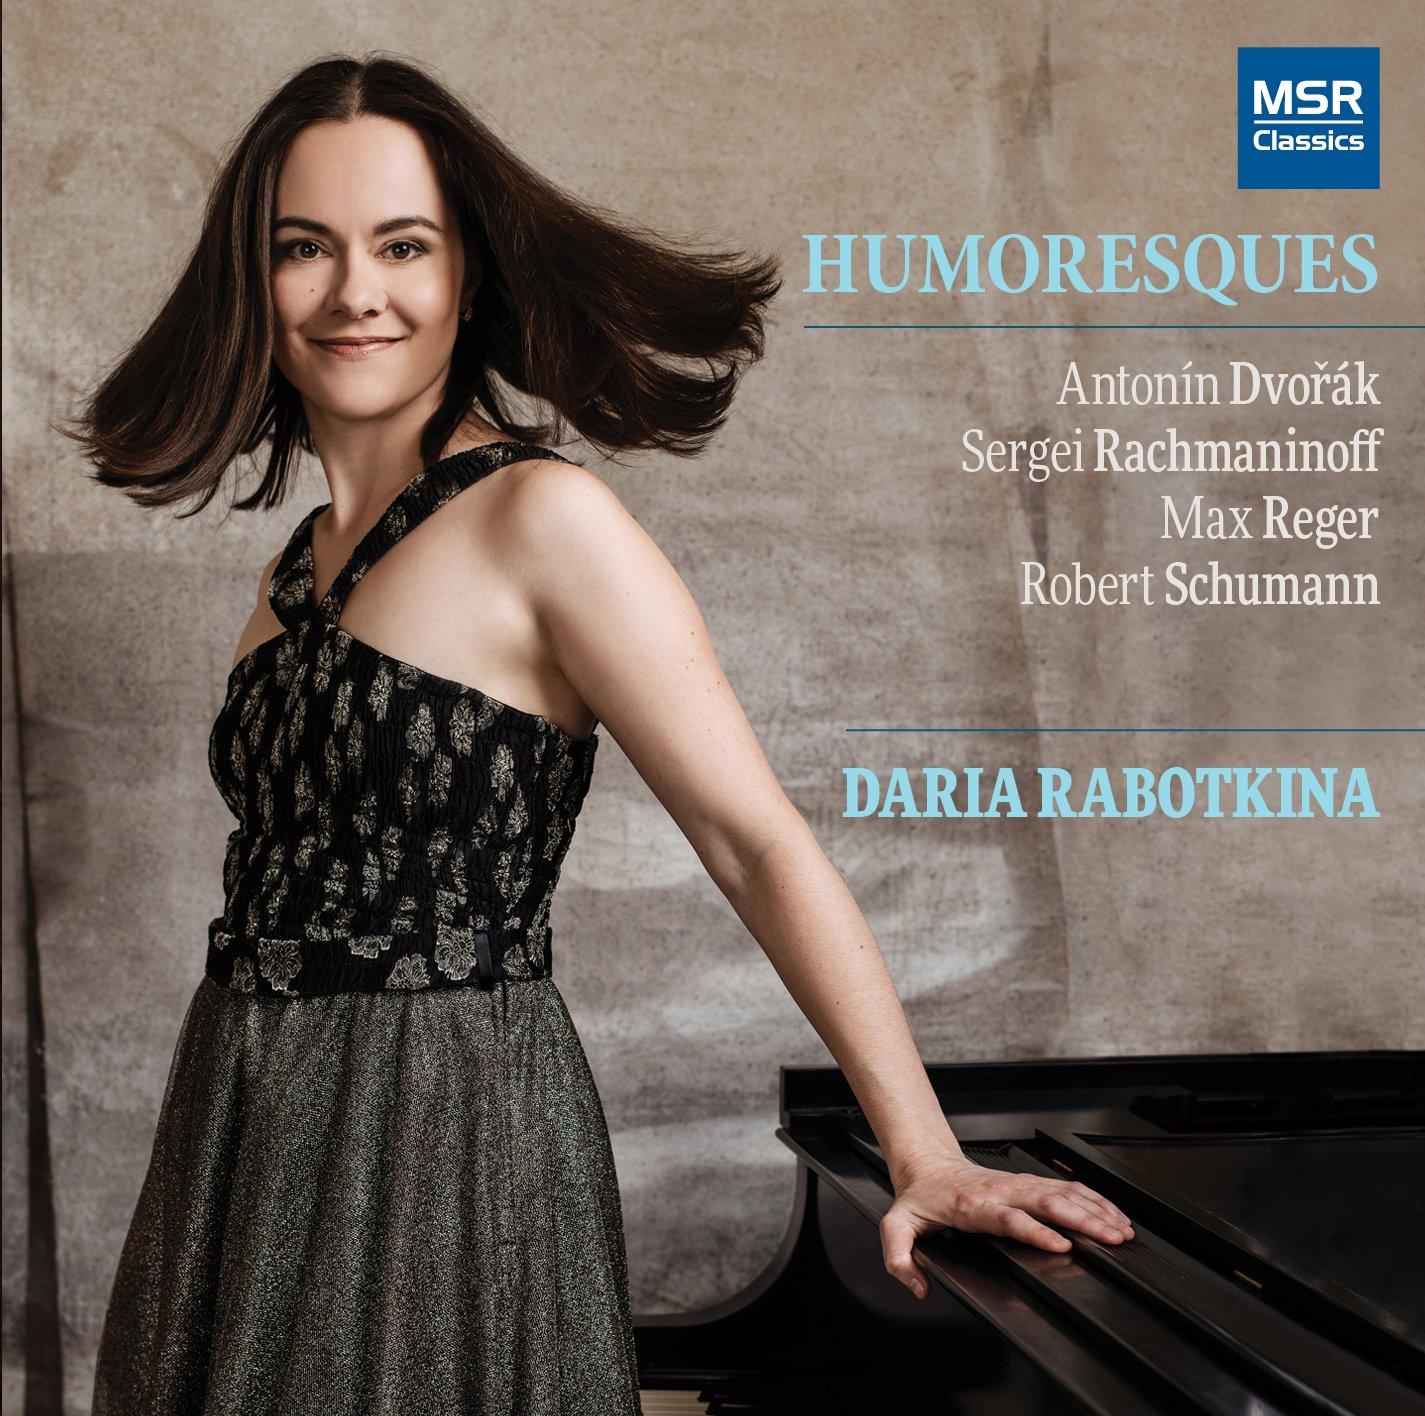 CD : Rabotkina - Humoresque (CD)